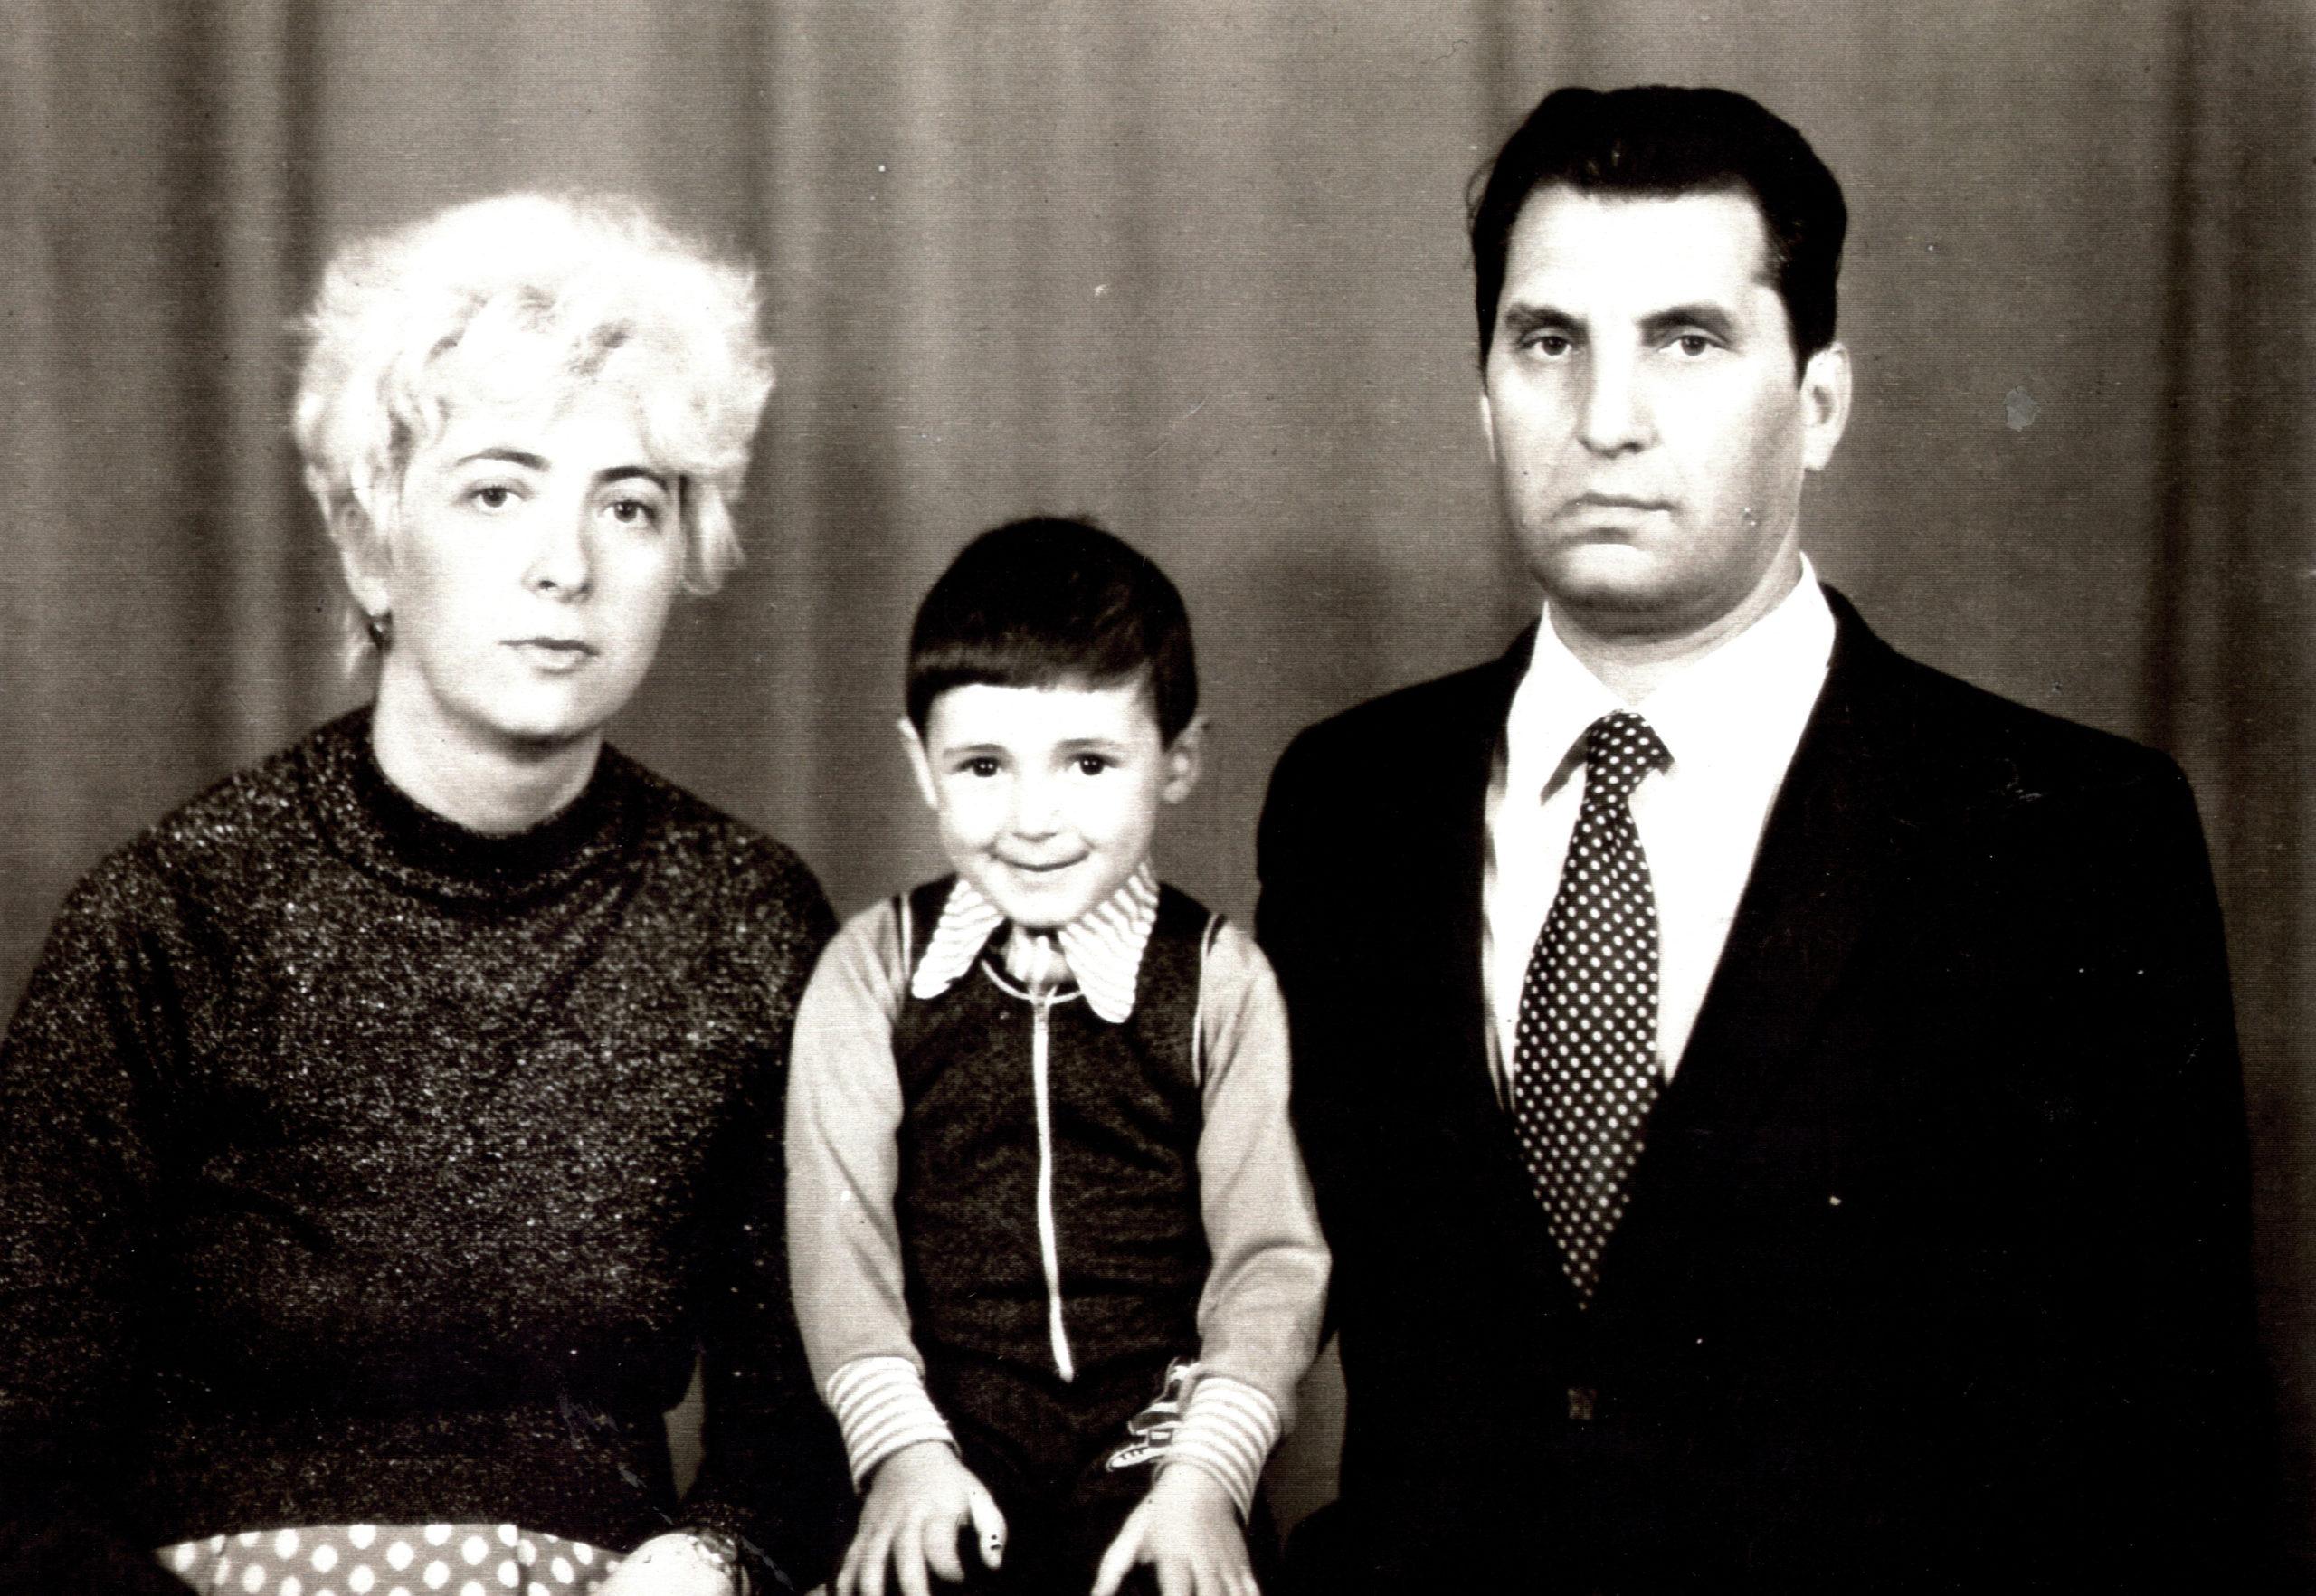 Efim Pisarenko with his second wife Inna Pisarenko and their son Ruvim Pisarenko